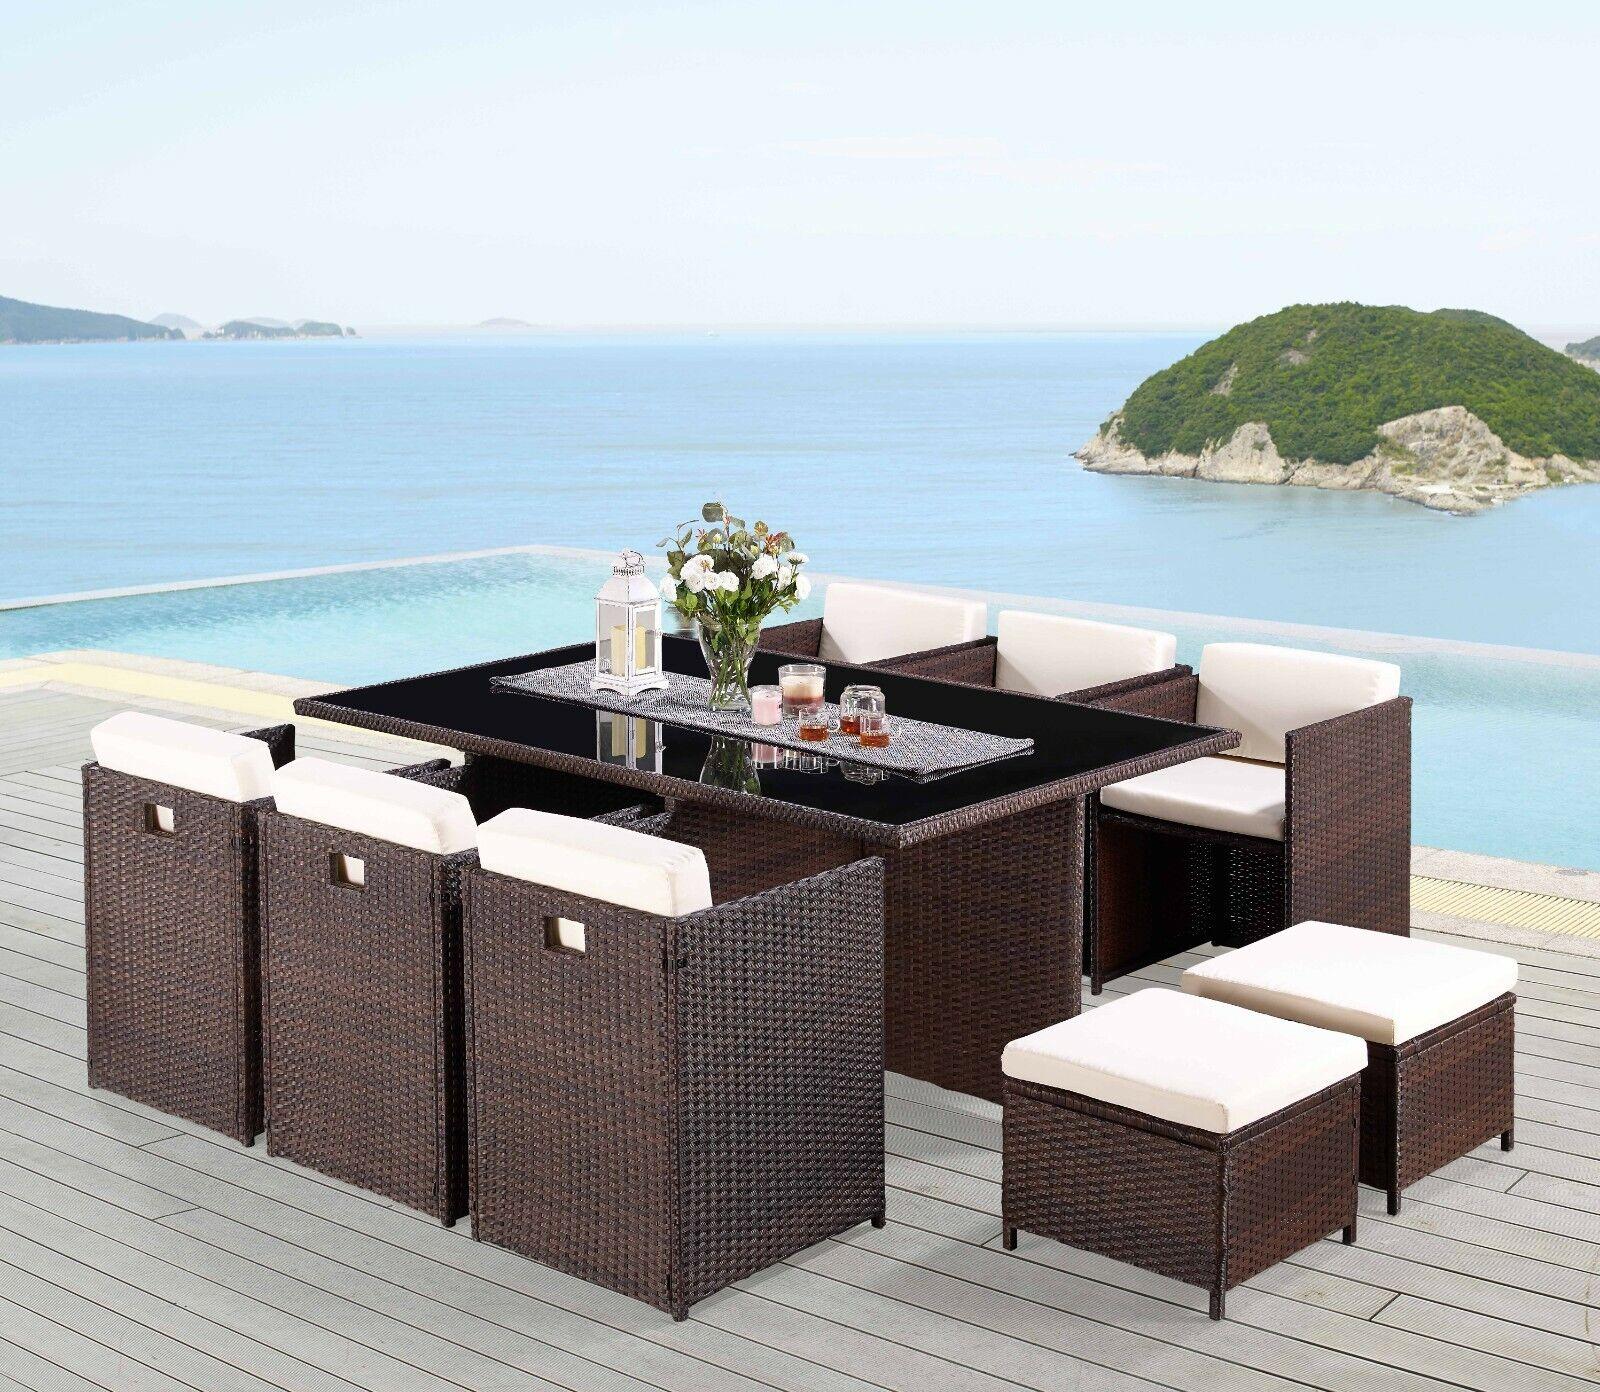 Garden Furniture - Rattan Garden Furniture Set 11 Piece Cube Outdoor Conservatory Patio Dining Set